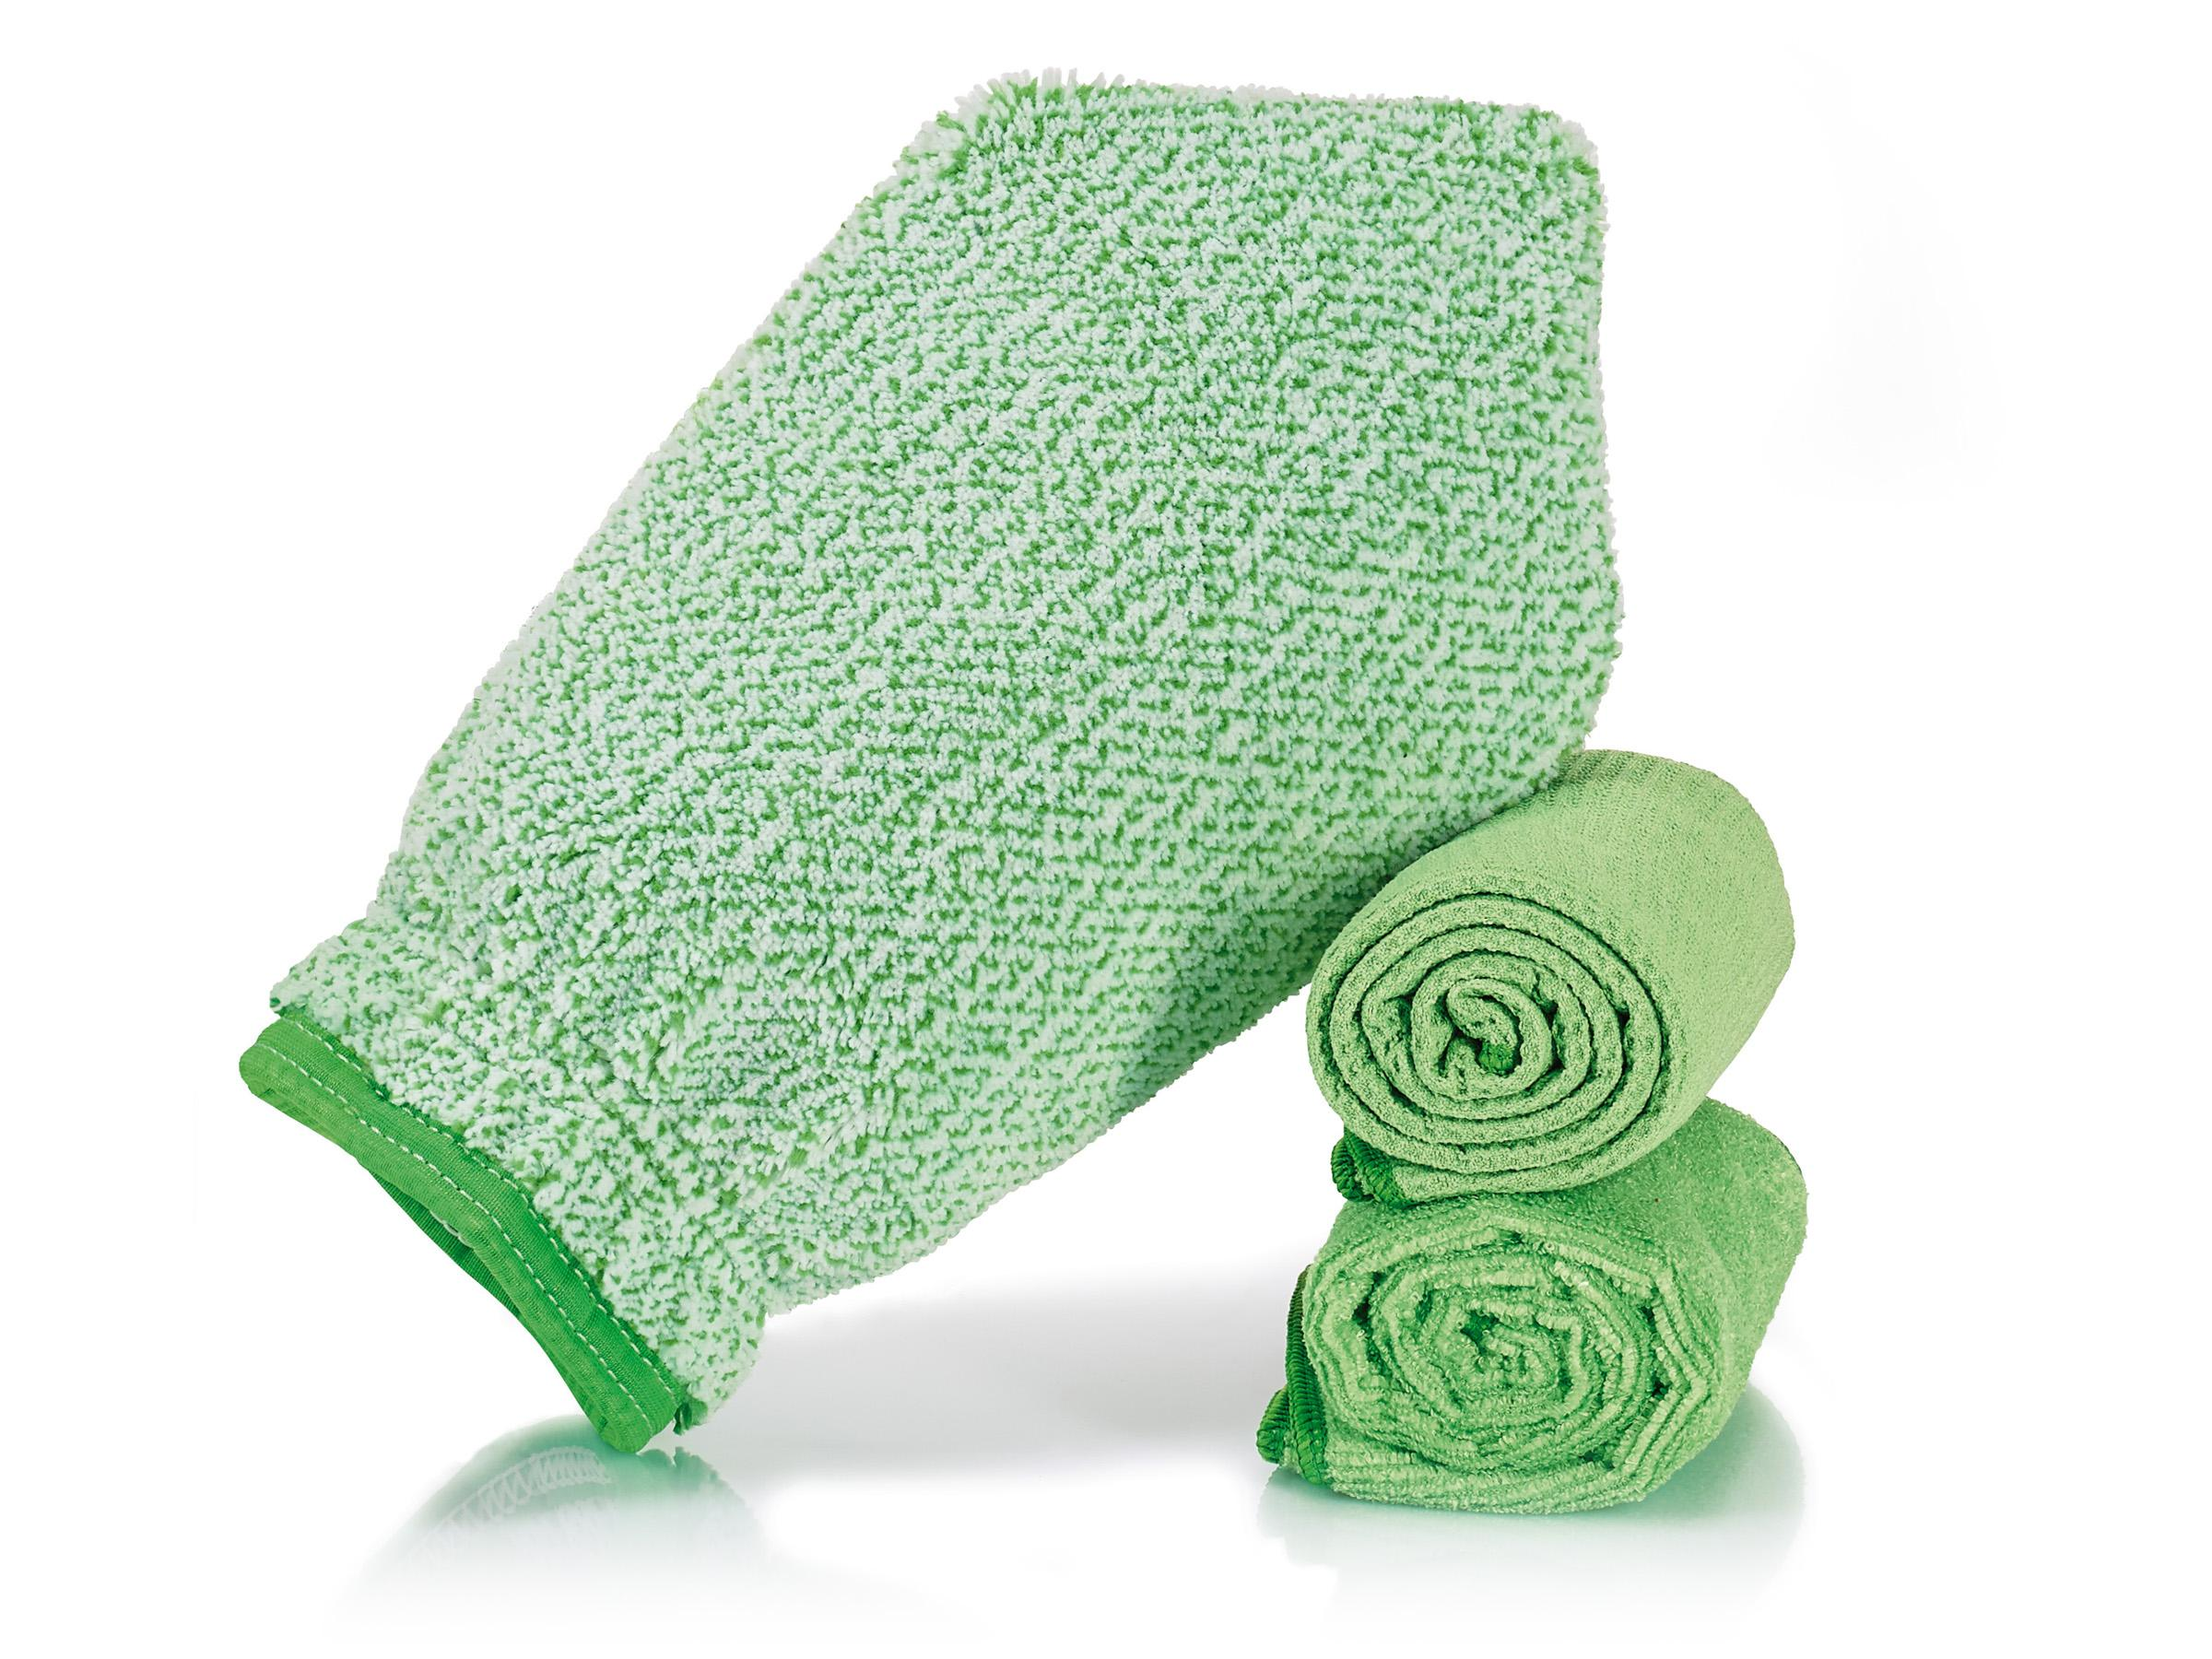 jemako fenster set handschuh online kaufen bei topclean24. Black Bedroom Furniture Sets. Home Design Ideas